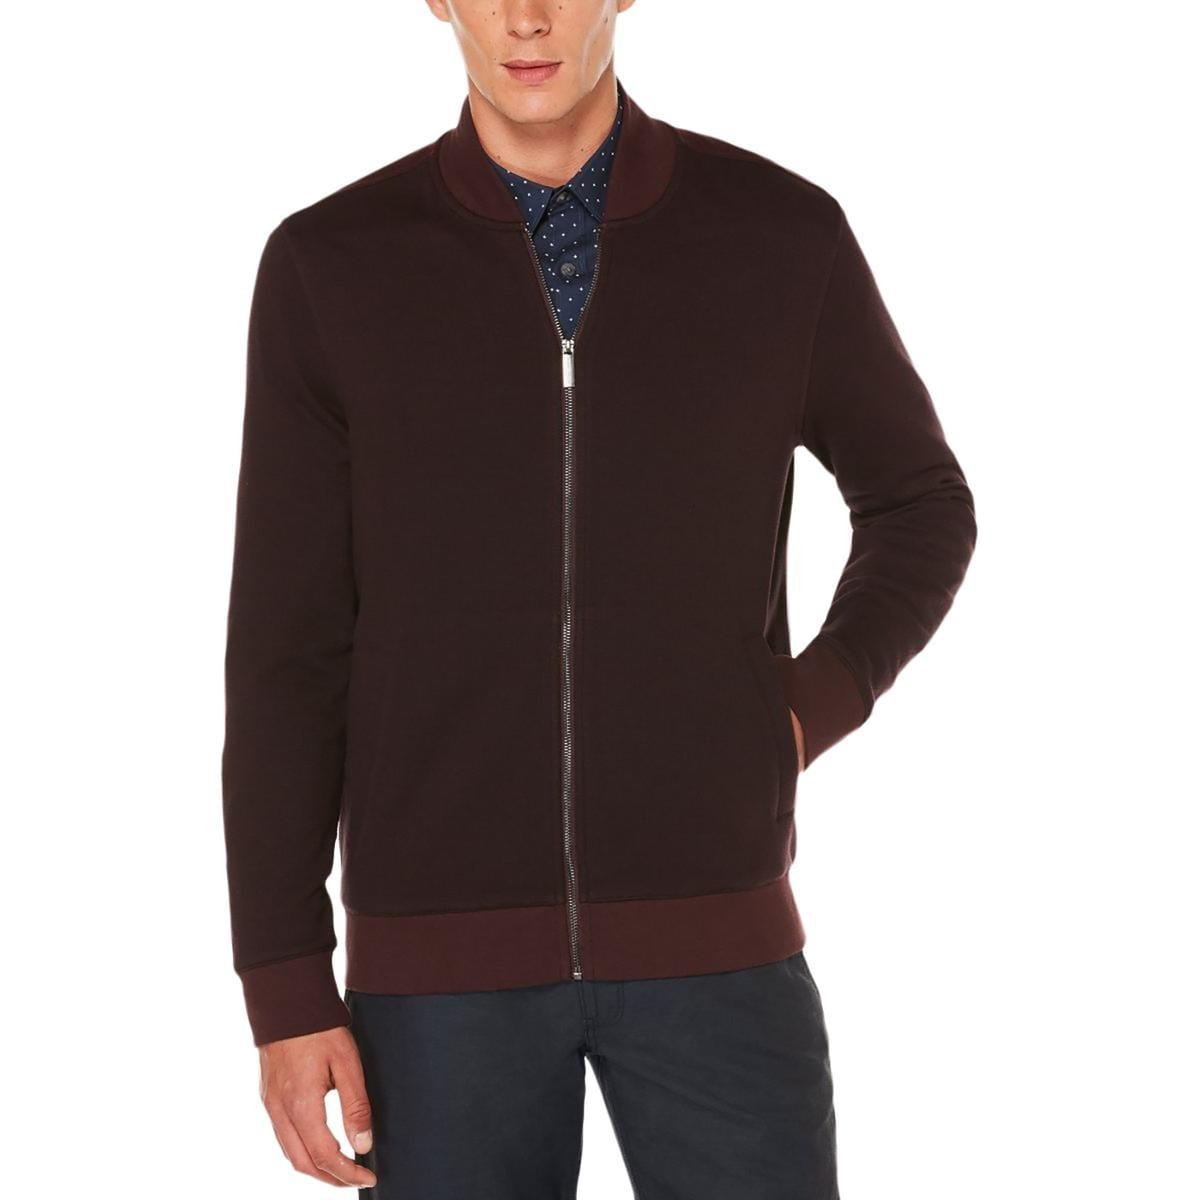 a9cdc8fa30 Shop Perry Ellis Mens Full Zip Sweater Herringbone Signature - Free ...